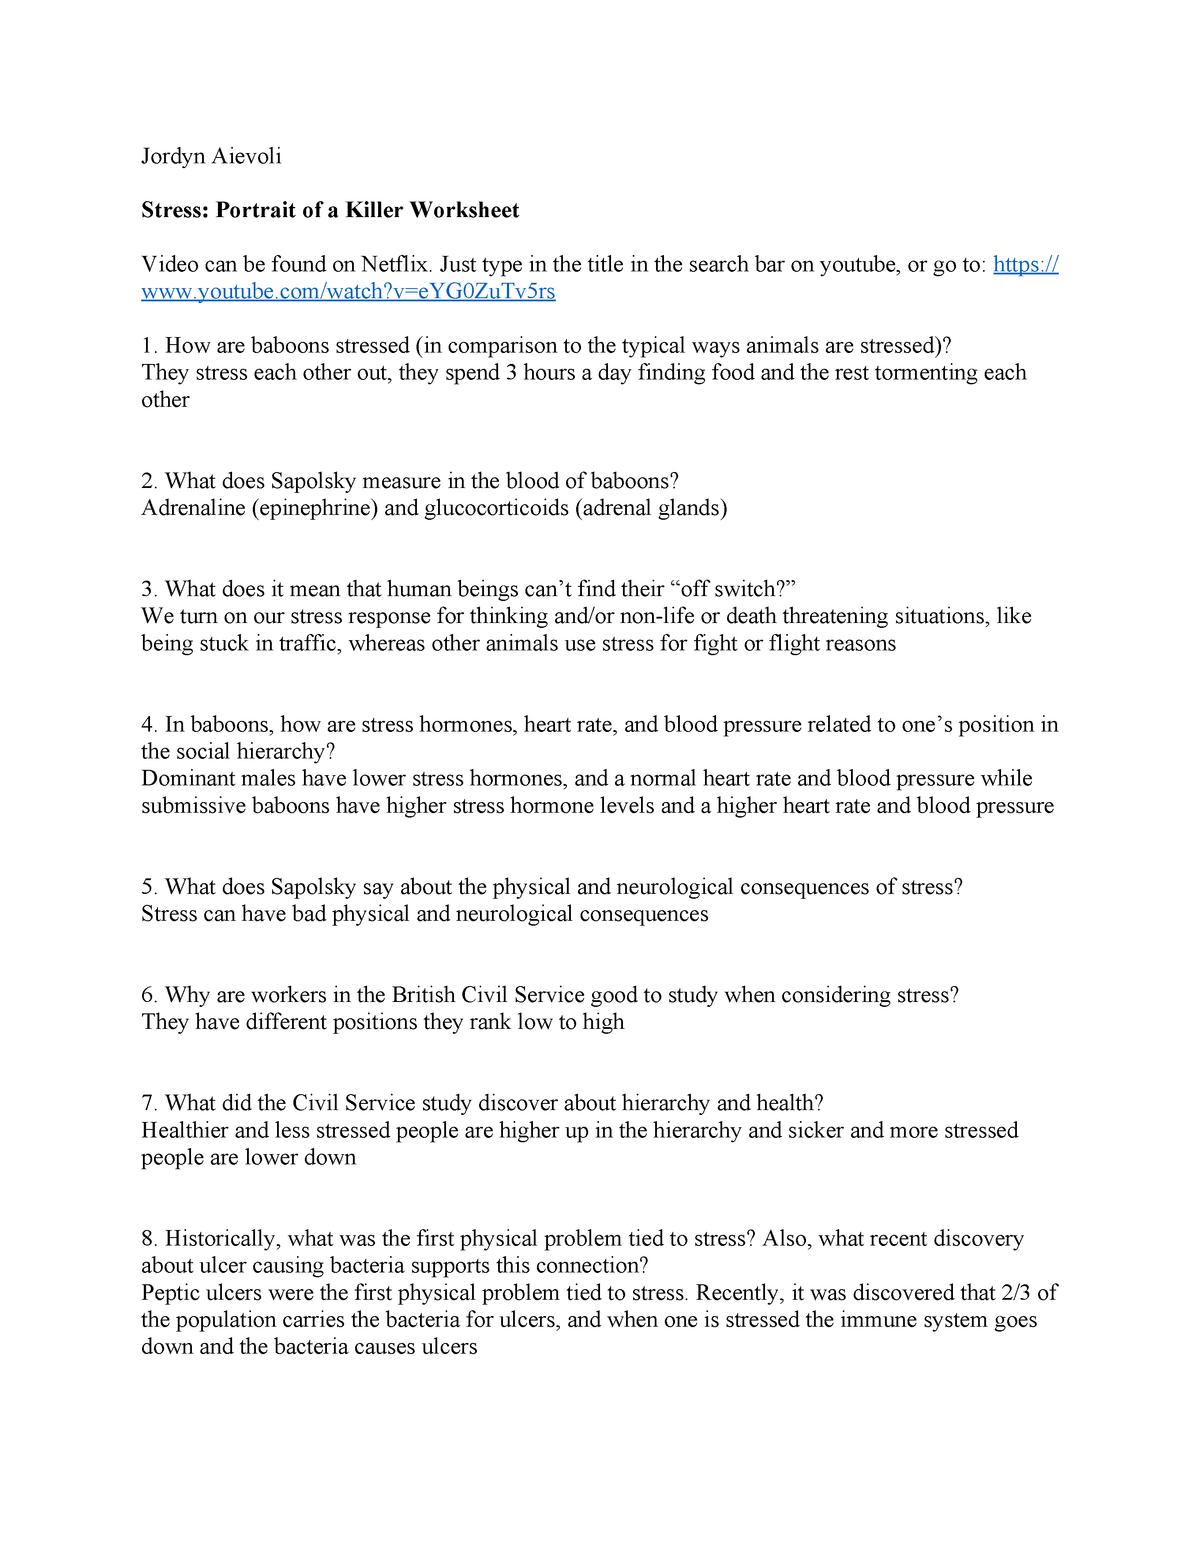 Stress Portrait Of A Killer Worksheet  Psyc 465 Health Psychology With Stress Portrait Of A Killer Worksheet